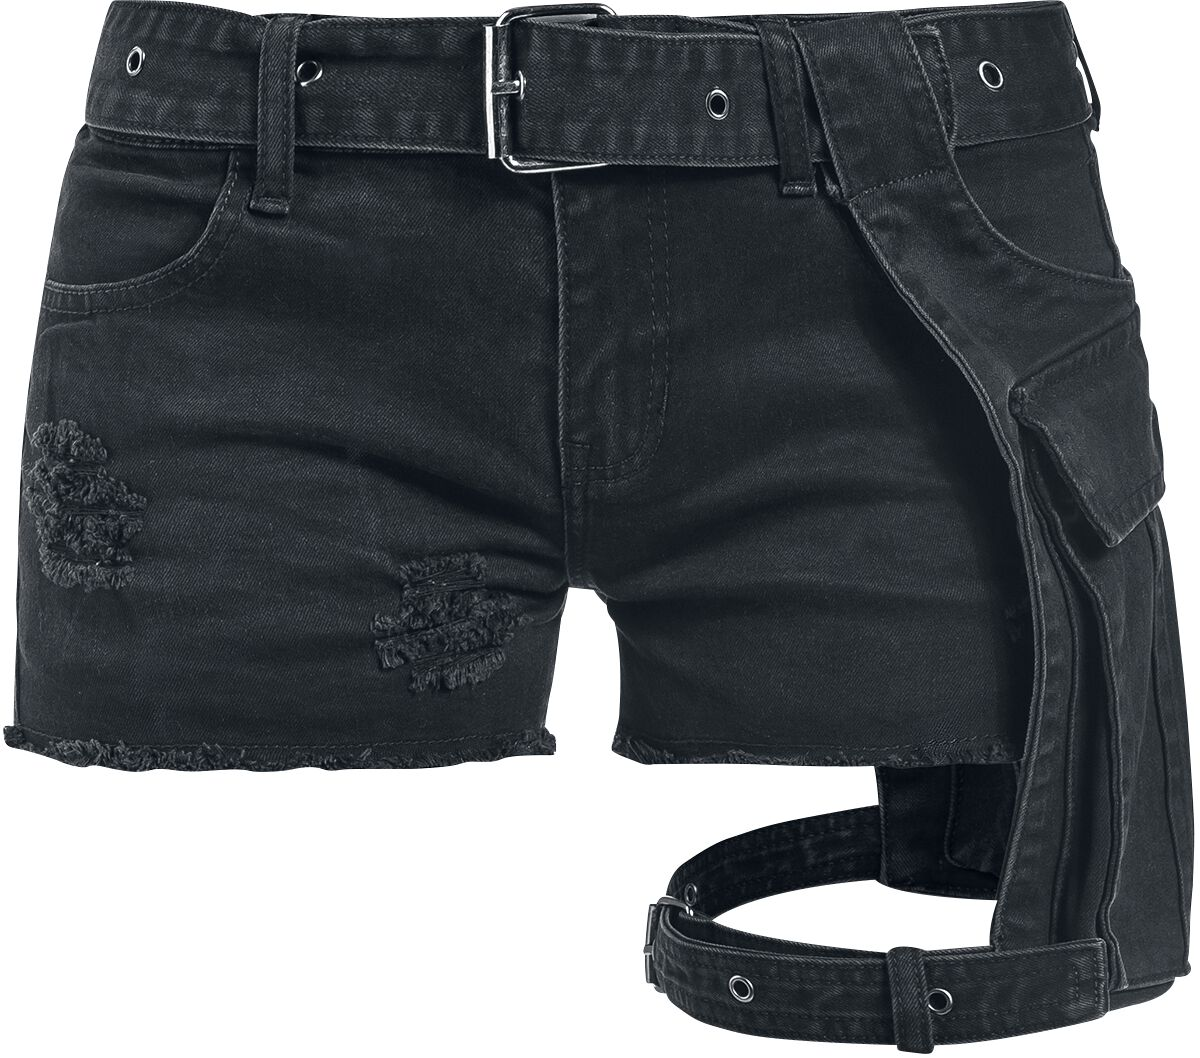 Image of   Black Premium by EMP Bite The Bullet Girlie shorts sort